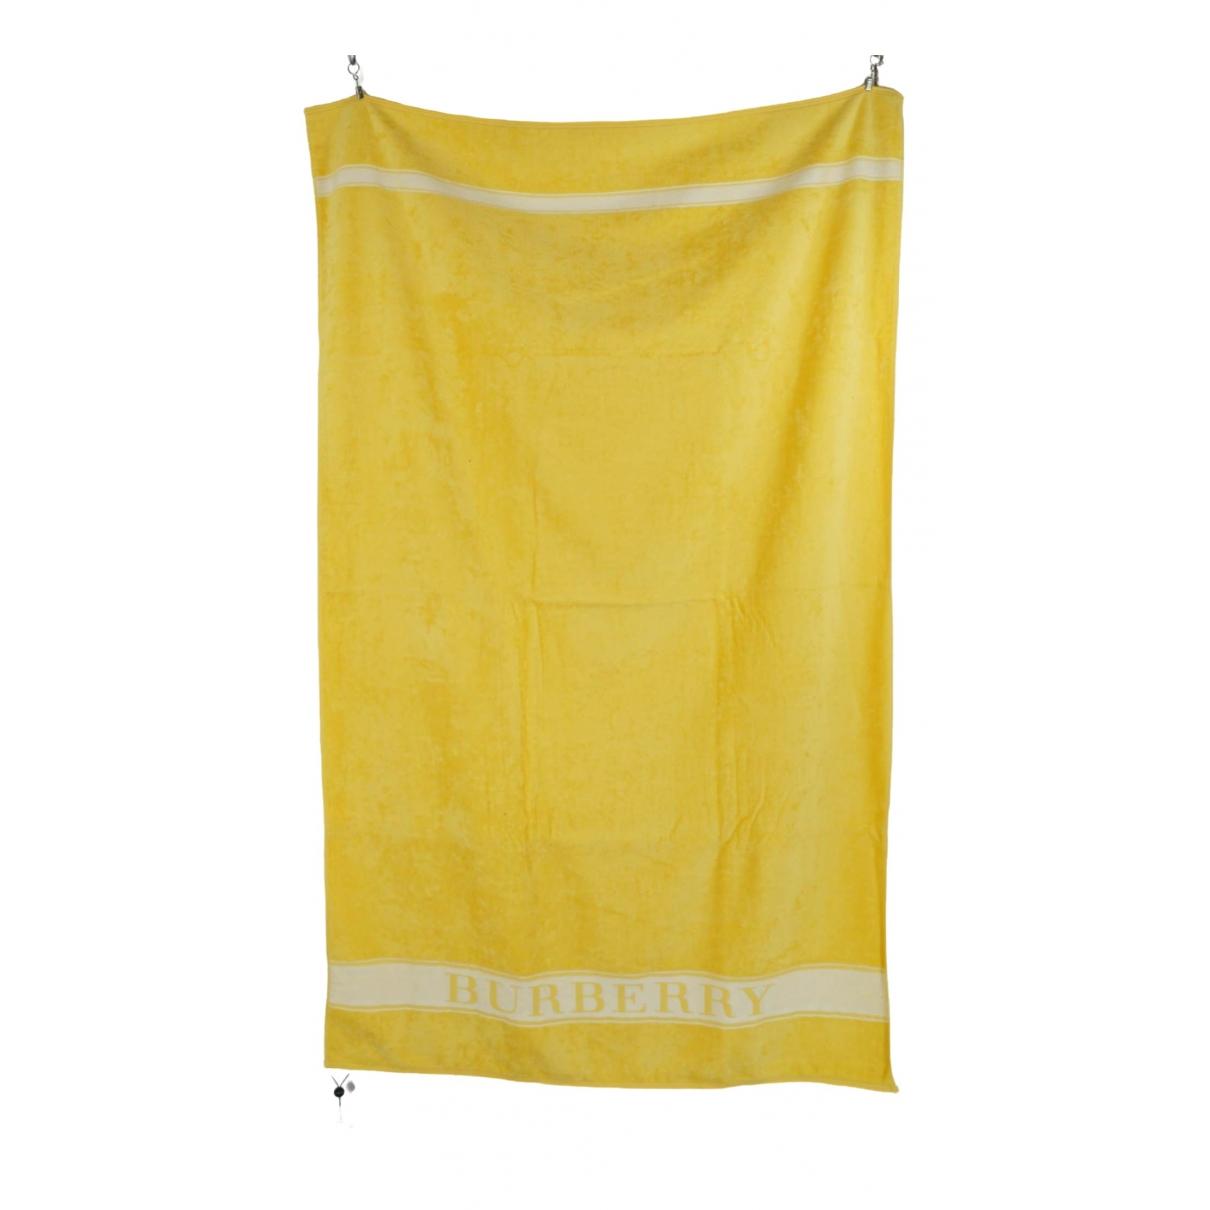 Textil de hogar Burberry